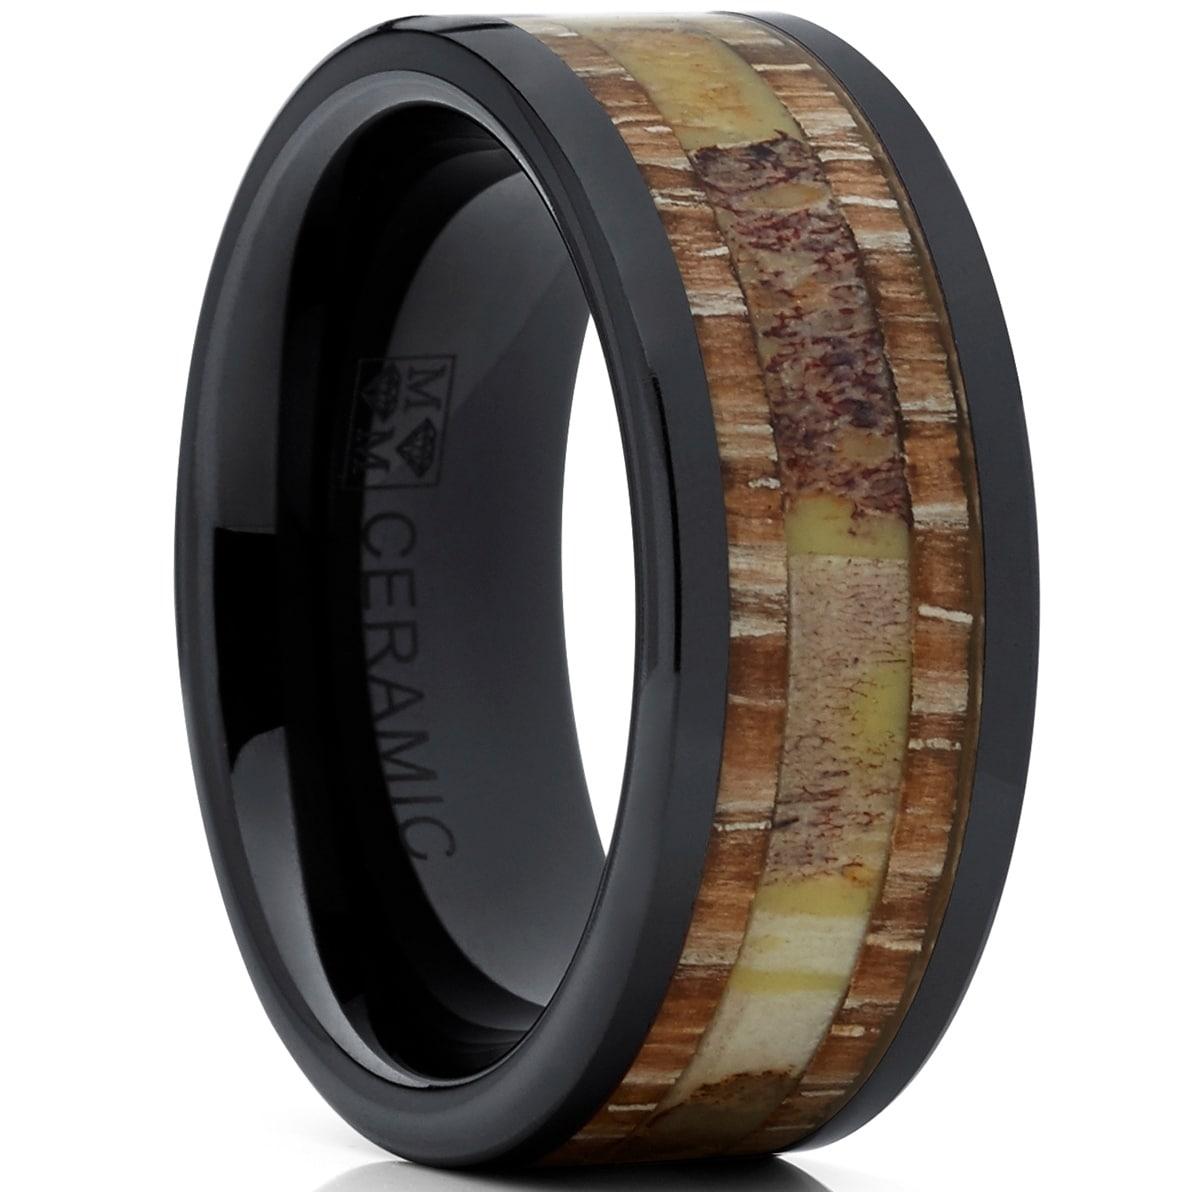 Wood Wedding Band.Oliveti Men S Ceramic Real Deer Antler And Wood Wedding Band Ring Comfort Fit